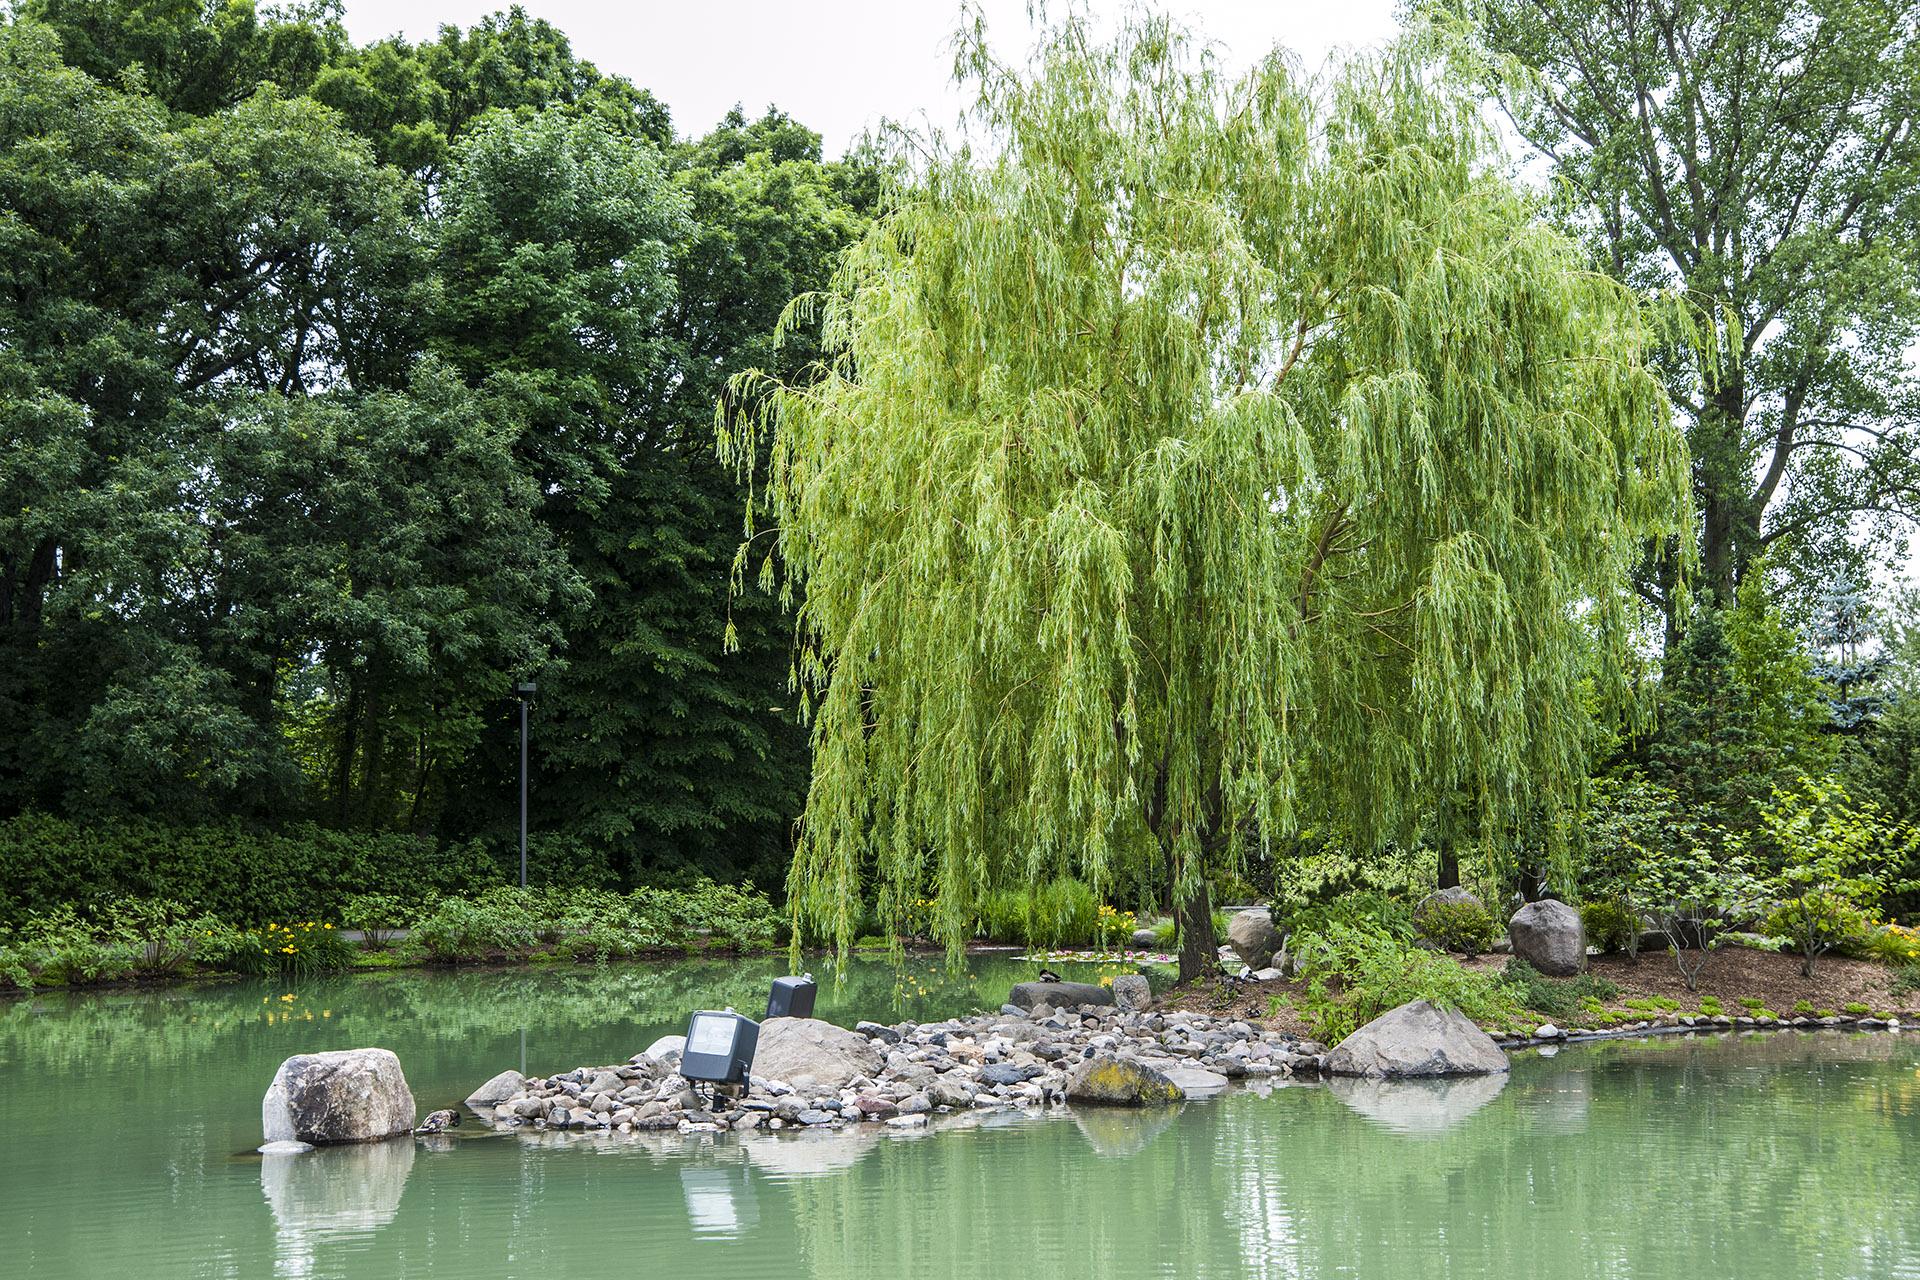 willow on stones.jpg